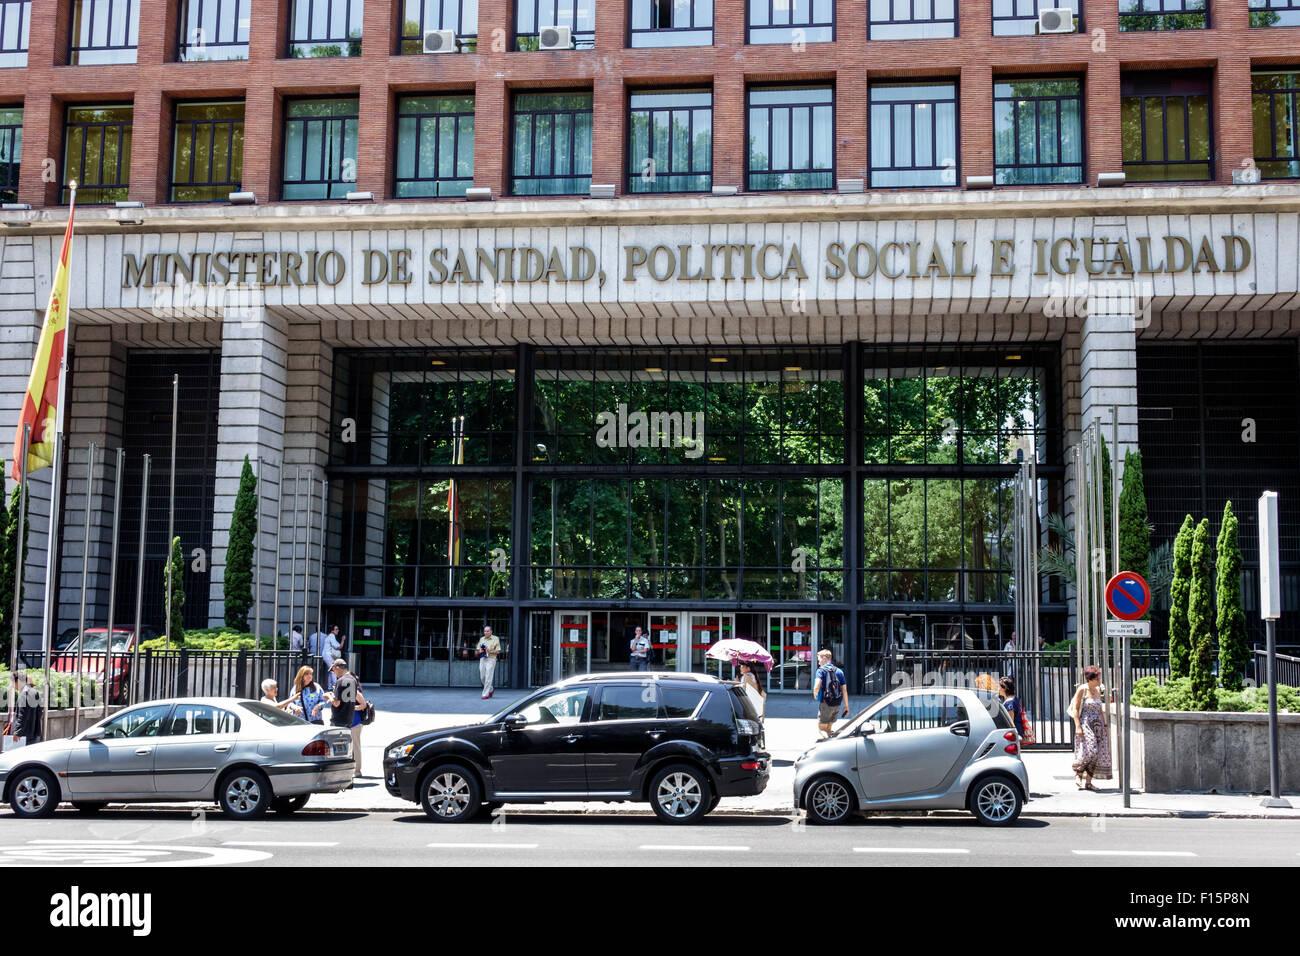 Madrid Spain Europe Spanish Centro Retiro Paseo del Prado Ministerio de Sanida Politica Social e Iguadad Ministry - Stock Image